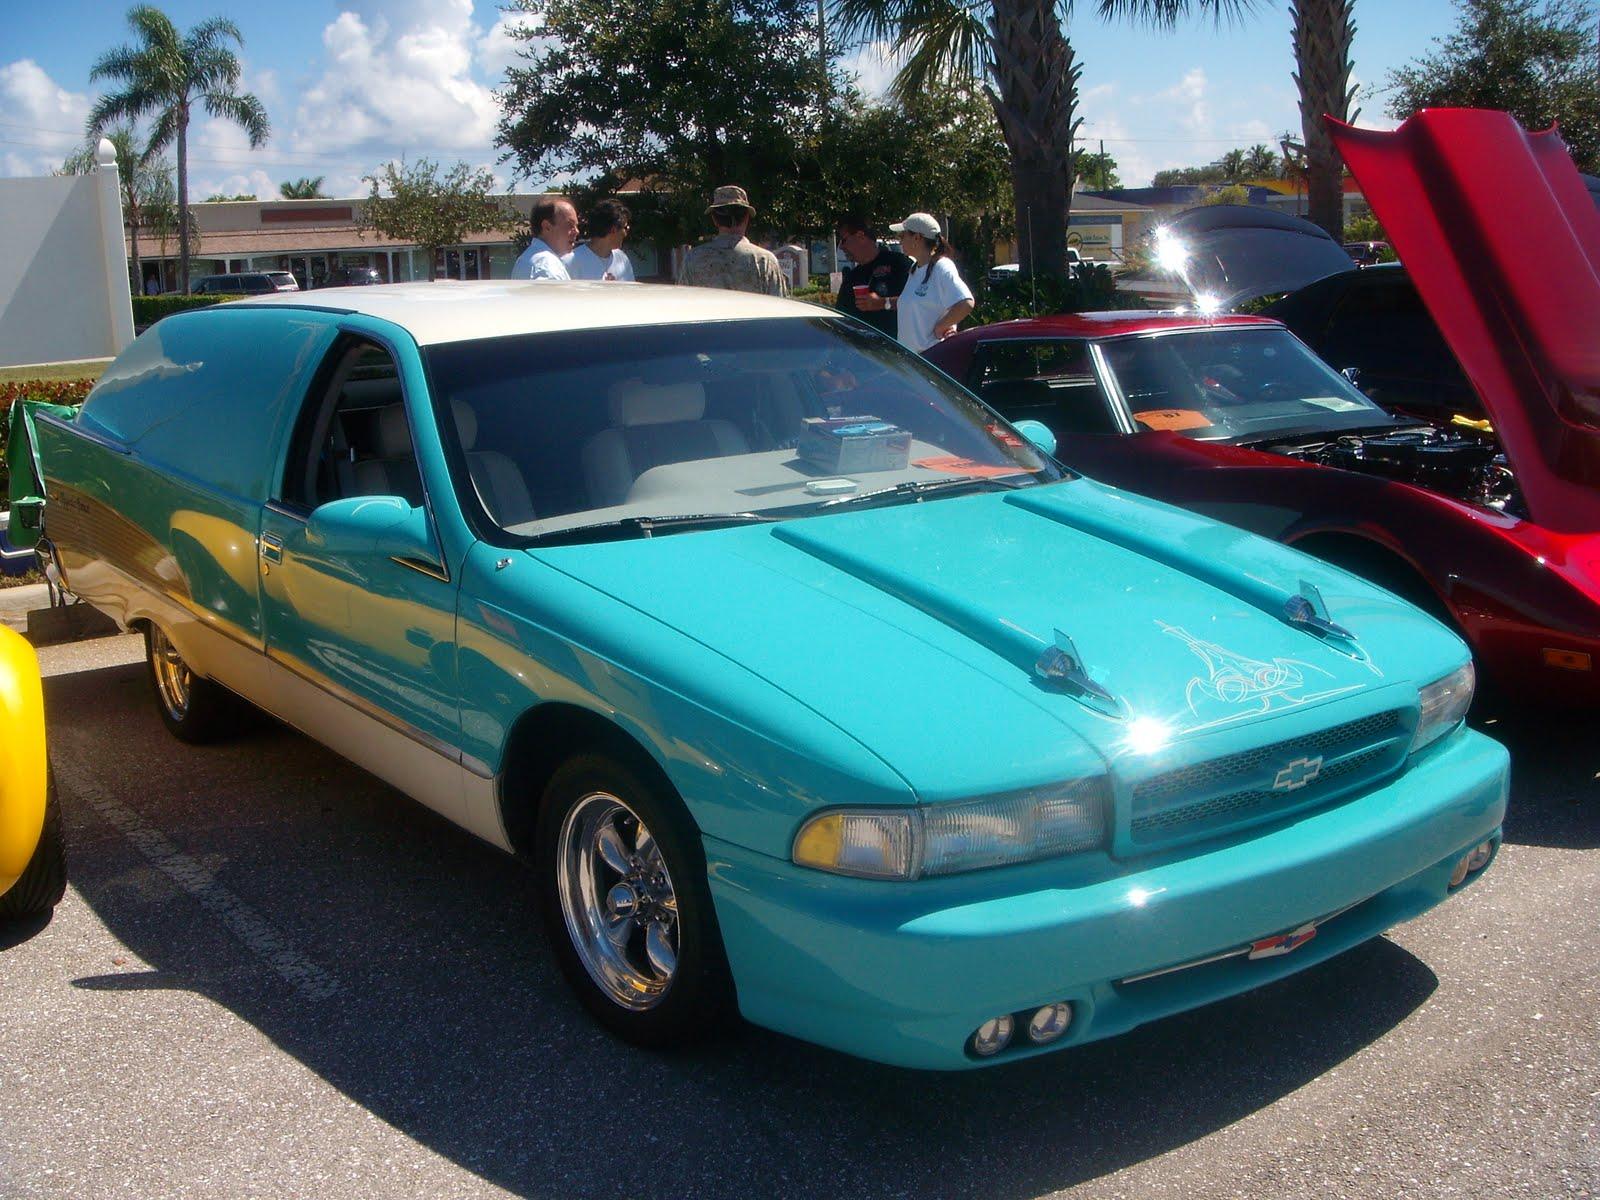 West virginia deals craigslist cars For Sales jobs wheeling Il